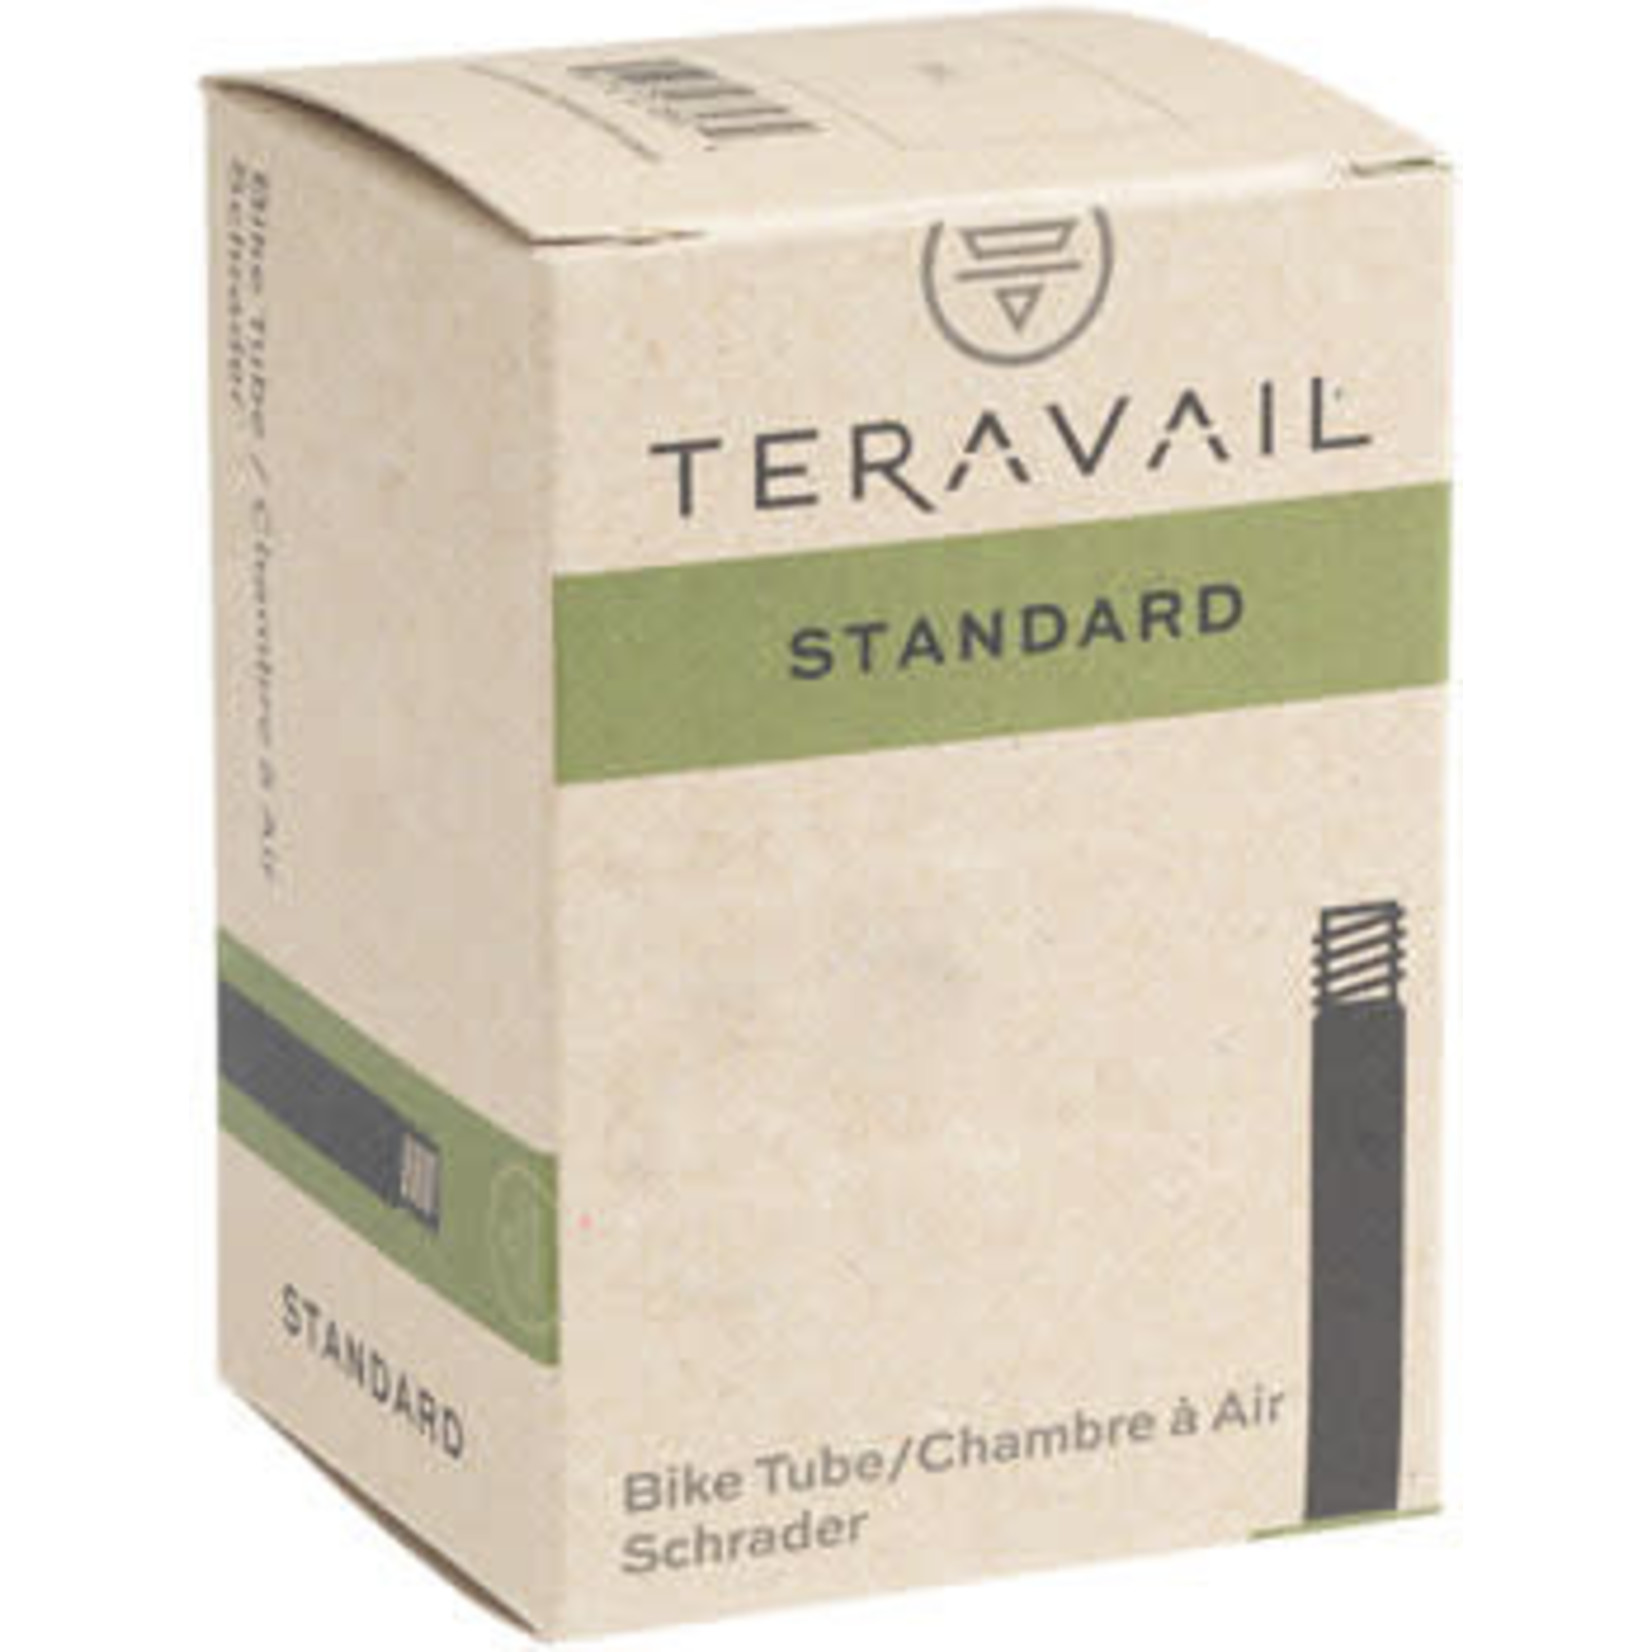 Q-Tubes Q-Tubes / Teravail 700 x 30-43mm 48mm Long Schrader Valve Tube